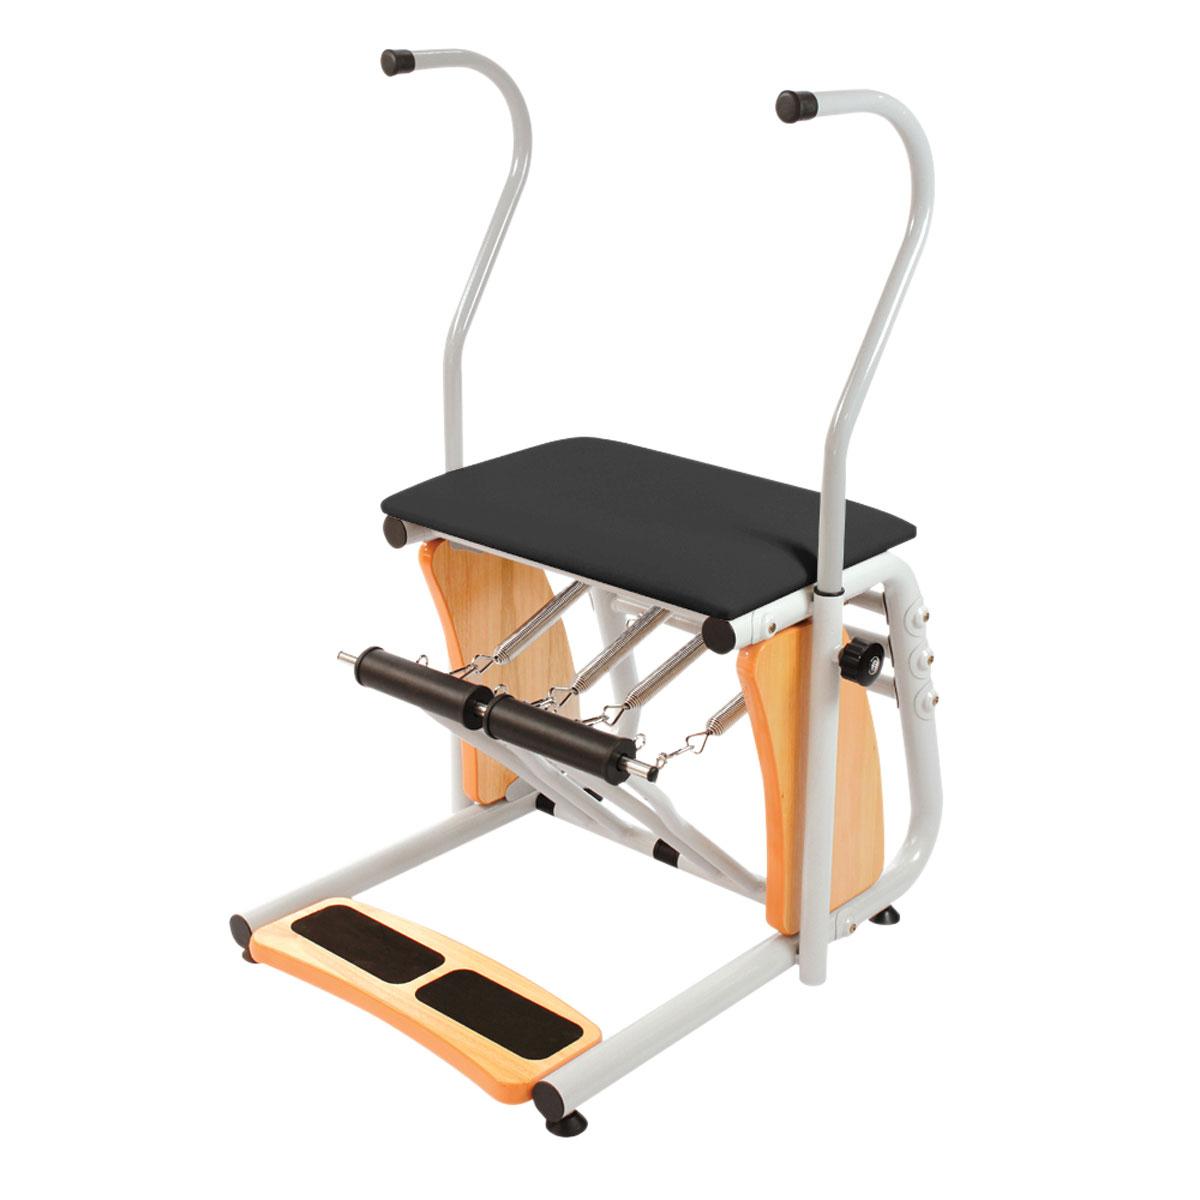 chair stool combo folding chairs picnic stark pilates 3b scientific w15401